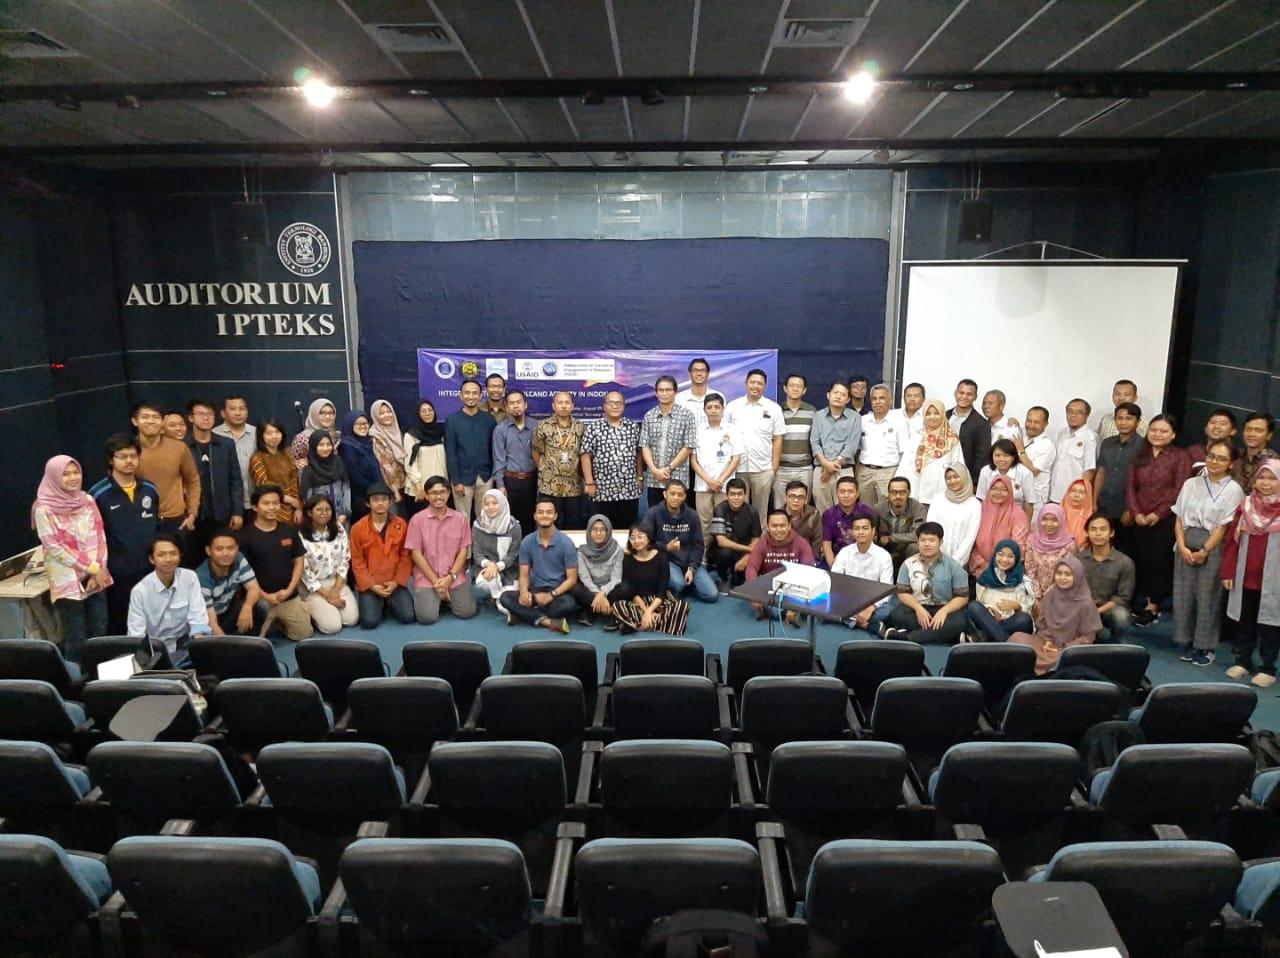 itb-held-integrated-studies-on-volcanoes-in-indonesia